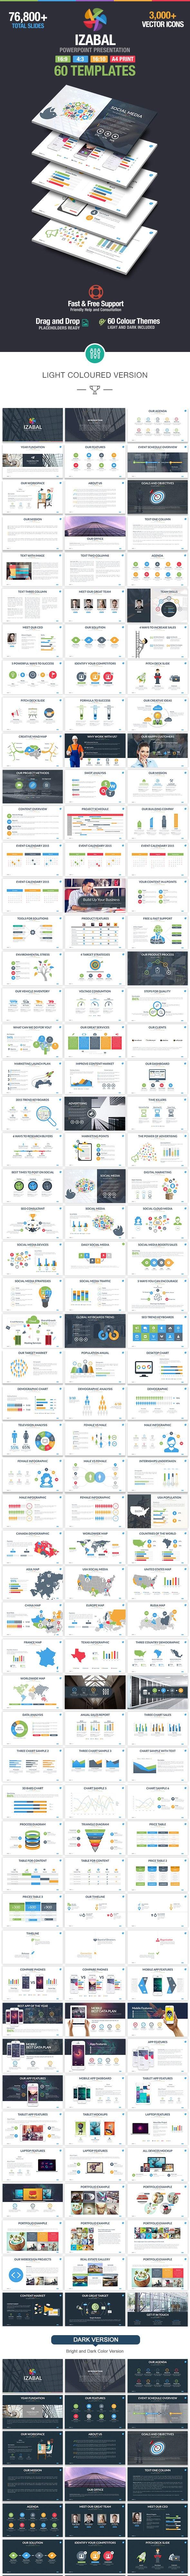 Izabal Multipurpose Powerpoint Template - Business PowerPoint Templates